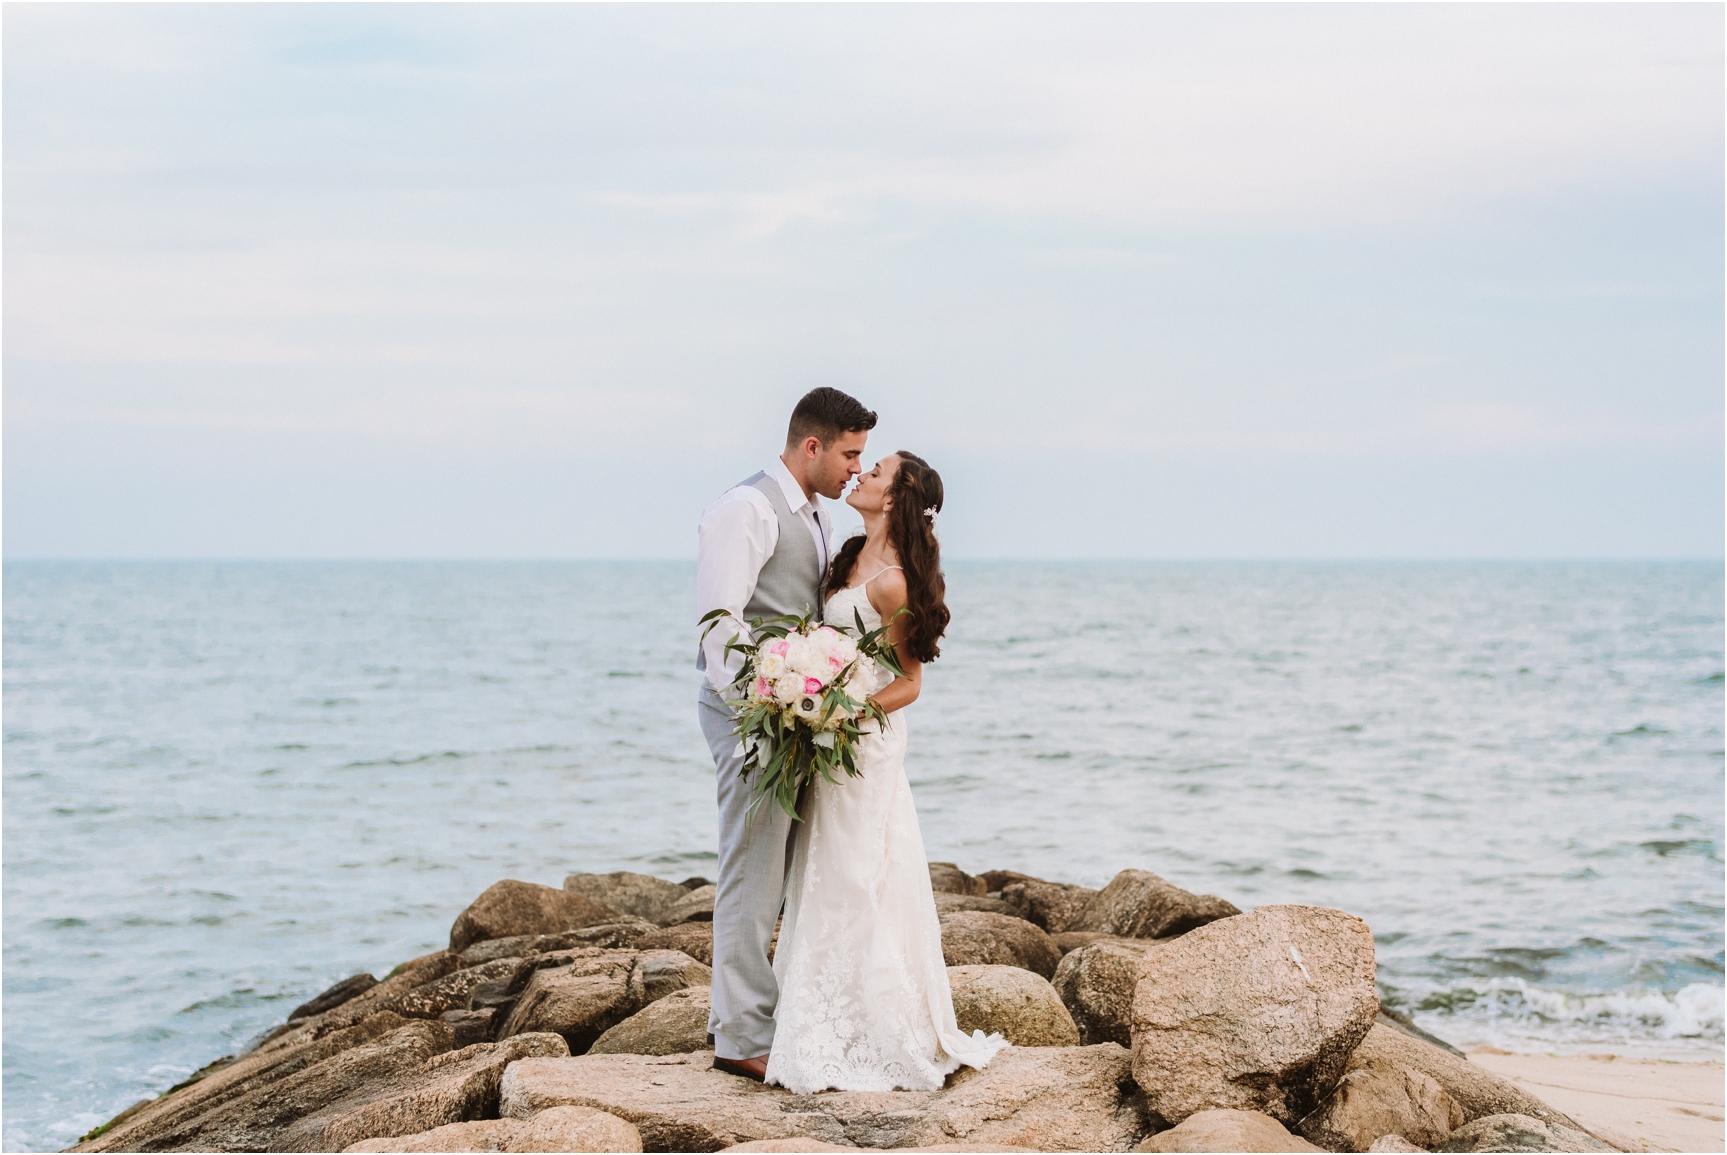 Sarah & Sam Pelham House Cape Cod Wedding Photographer-176.jpg